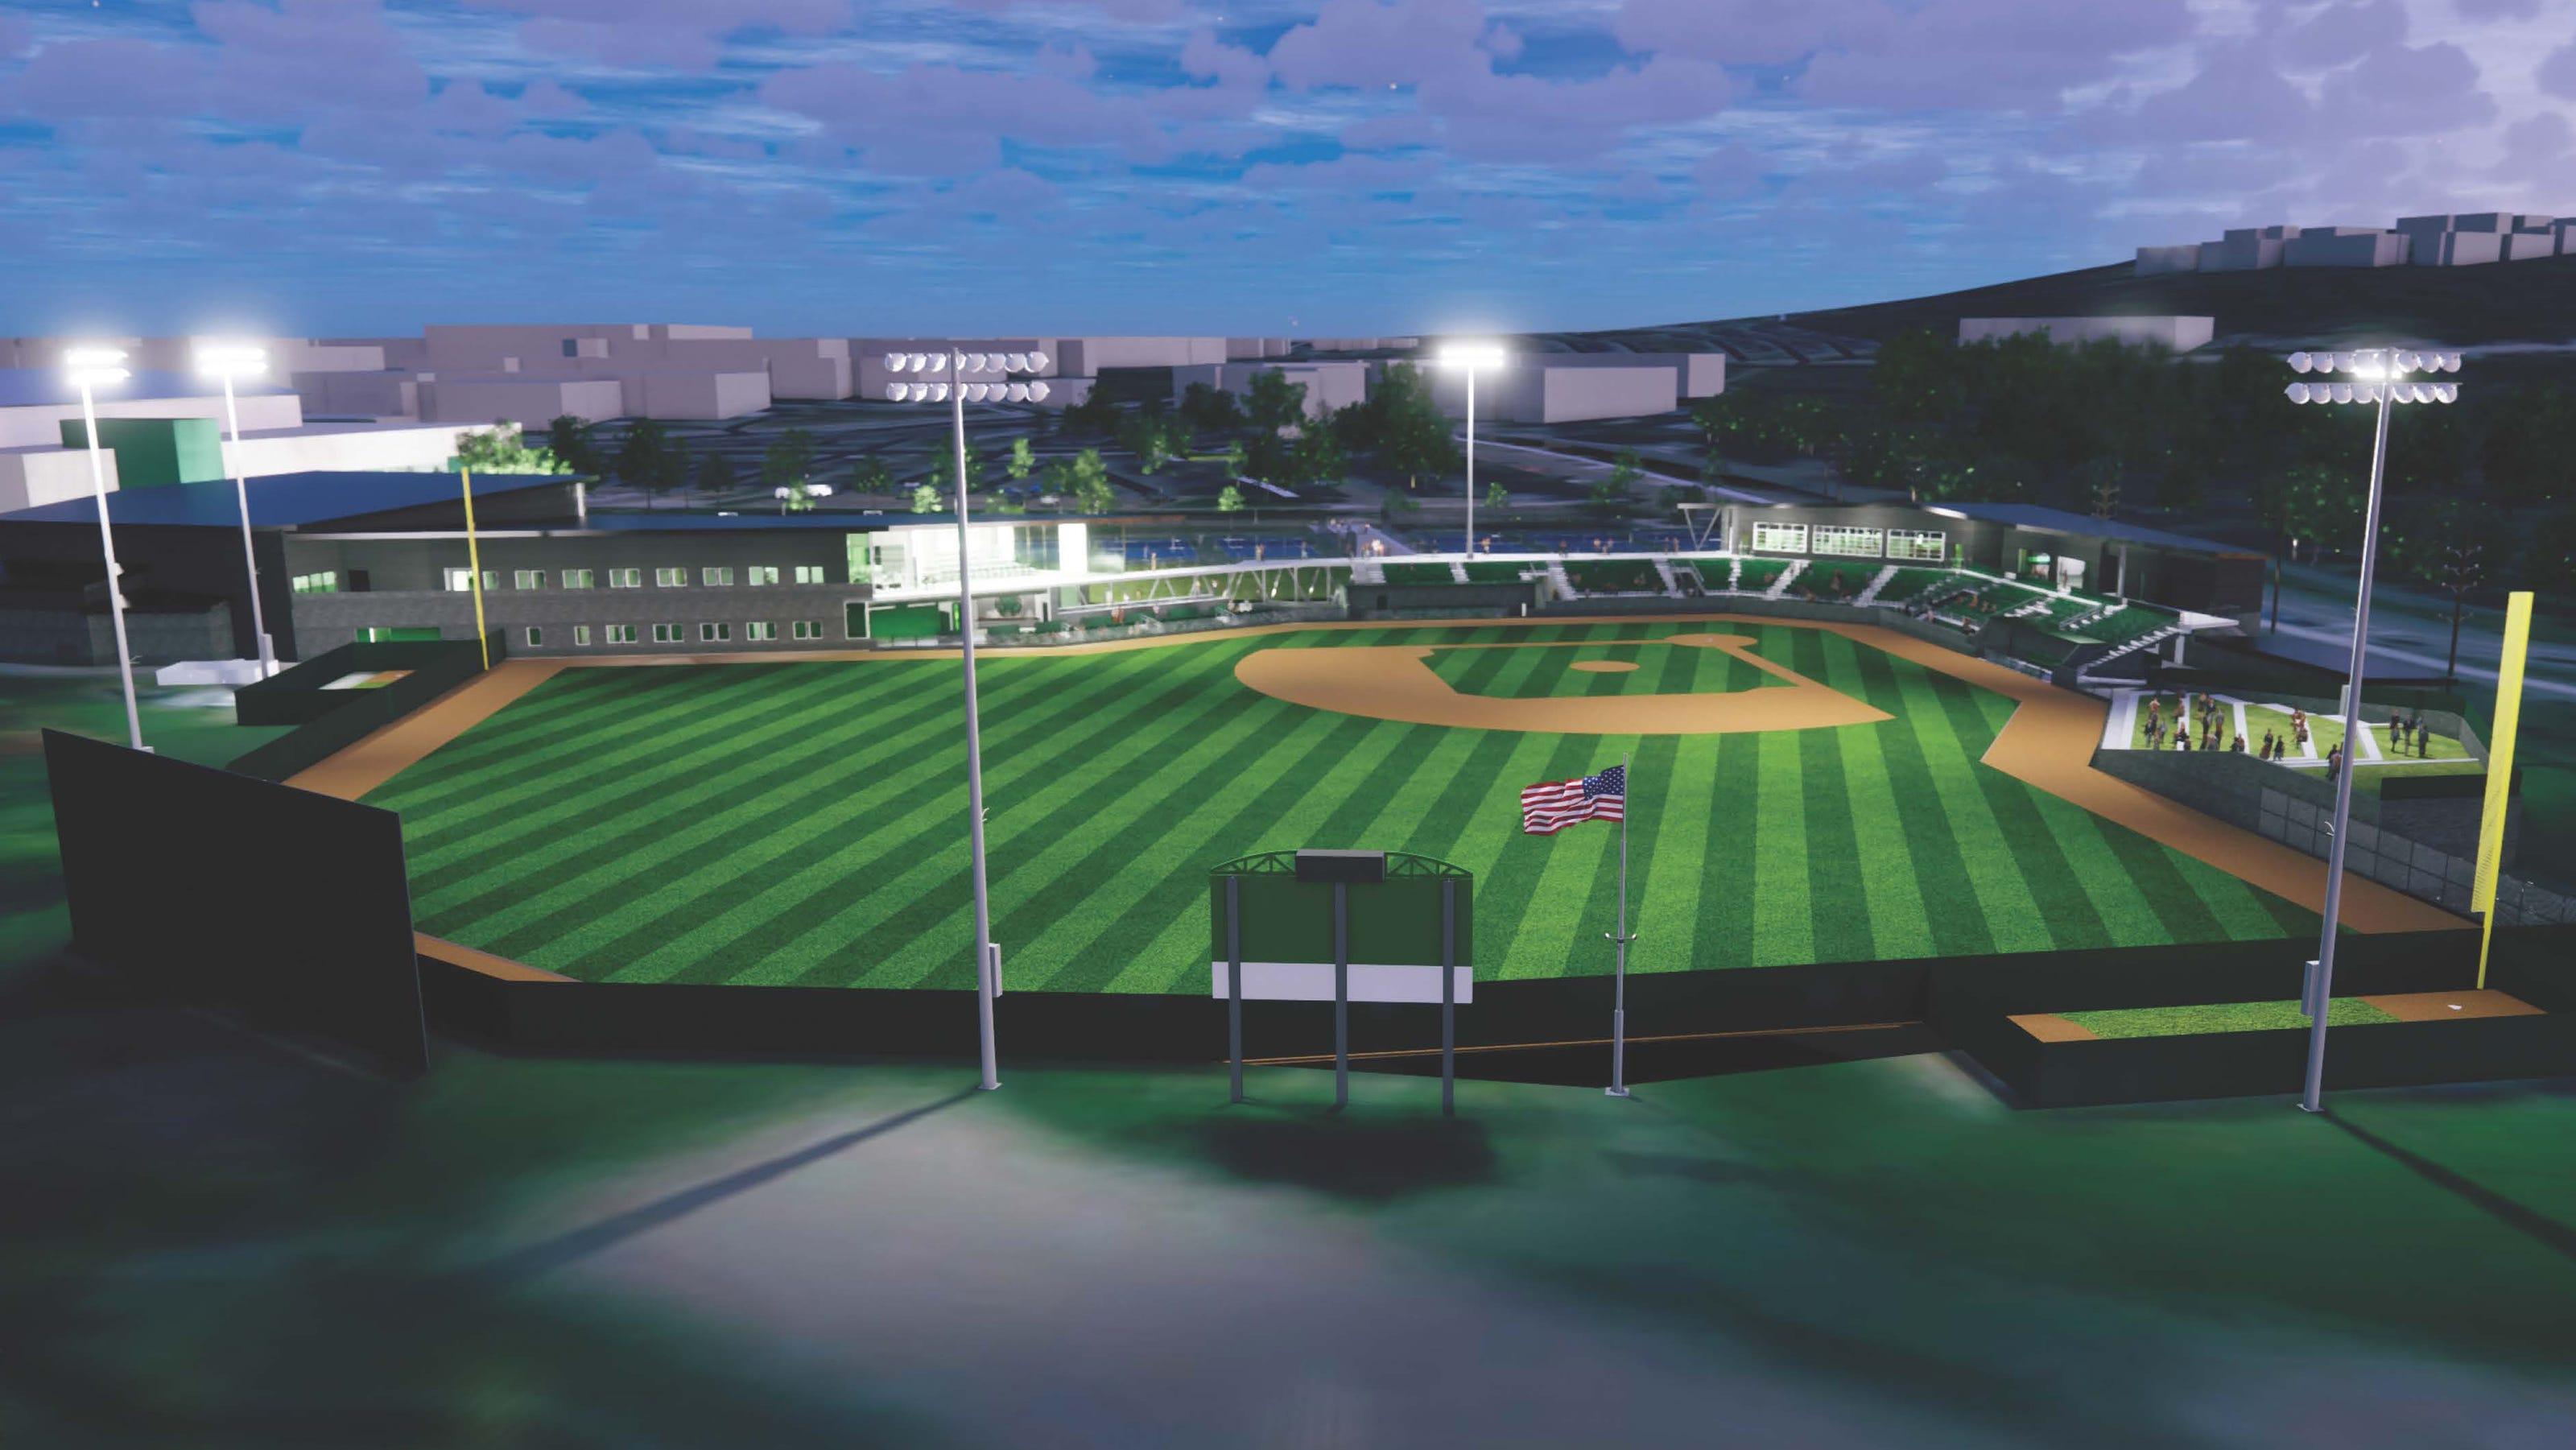 Binghamton University Receives 60m For Baseball Facilities